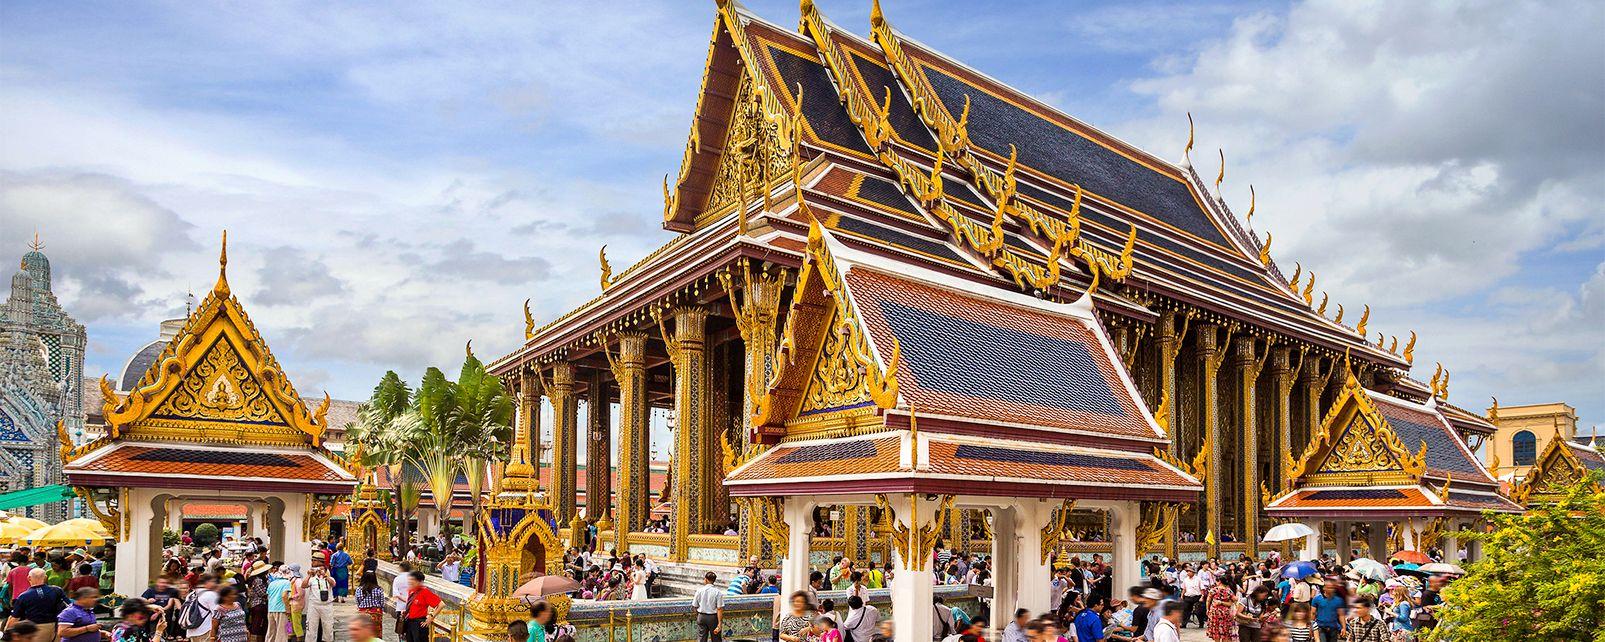 Il wat Phra Kaew, Wat Phra Kaew - Bangkok, I monumenti, Thailandia